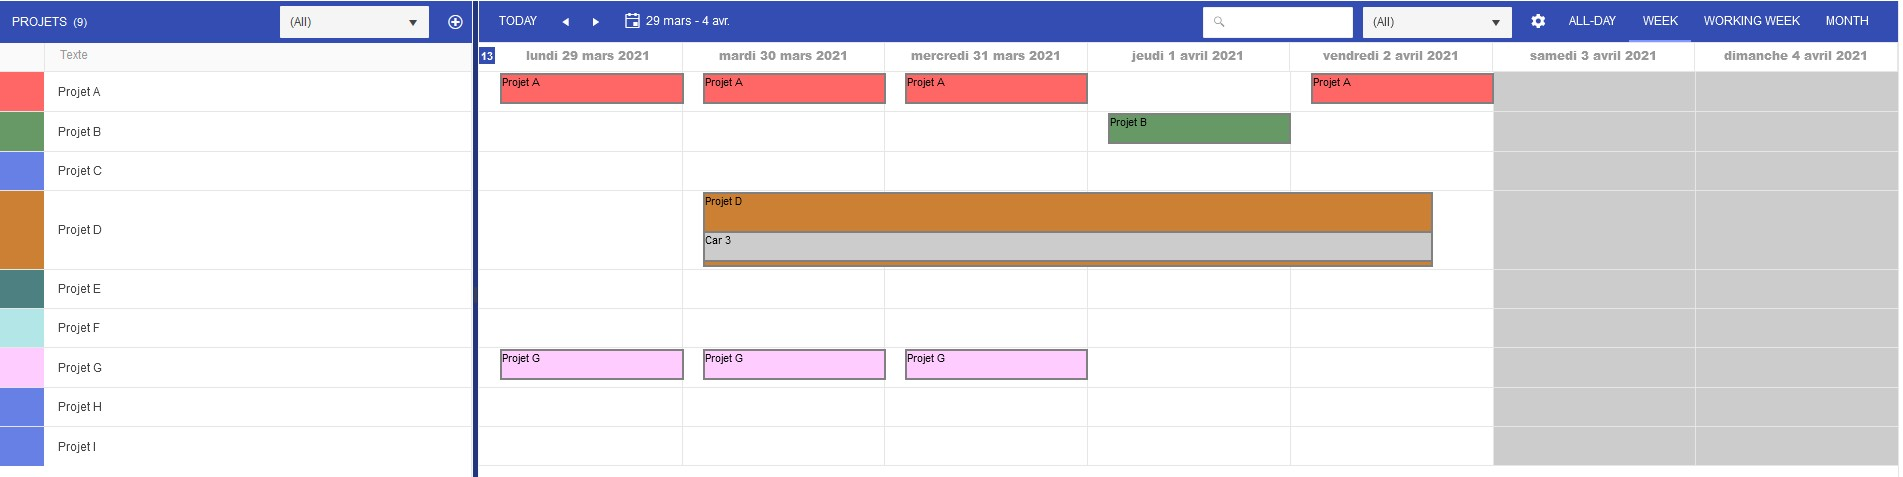 vpportal_schedule_week_view